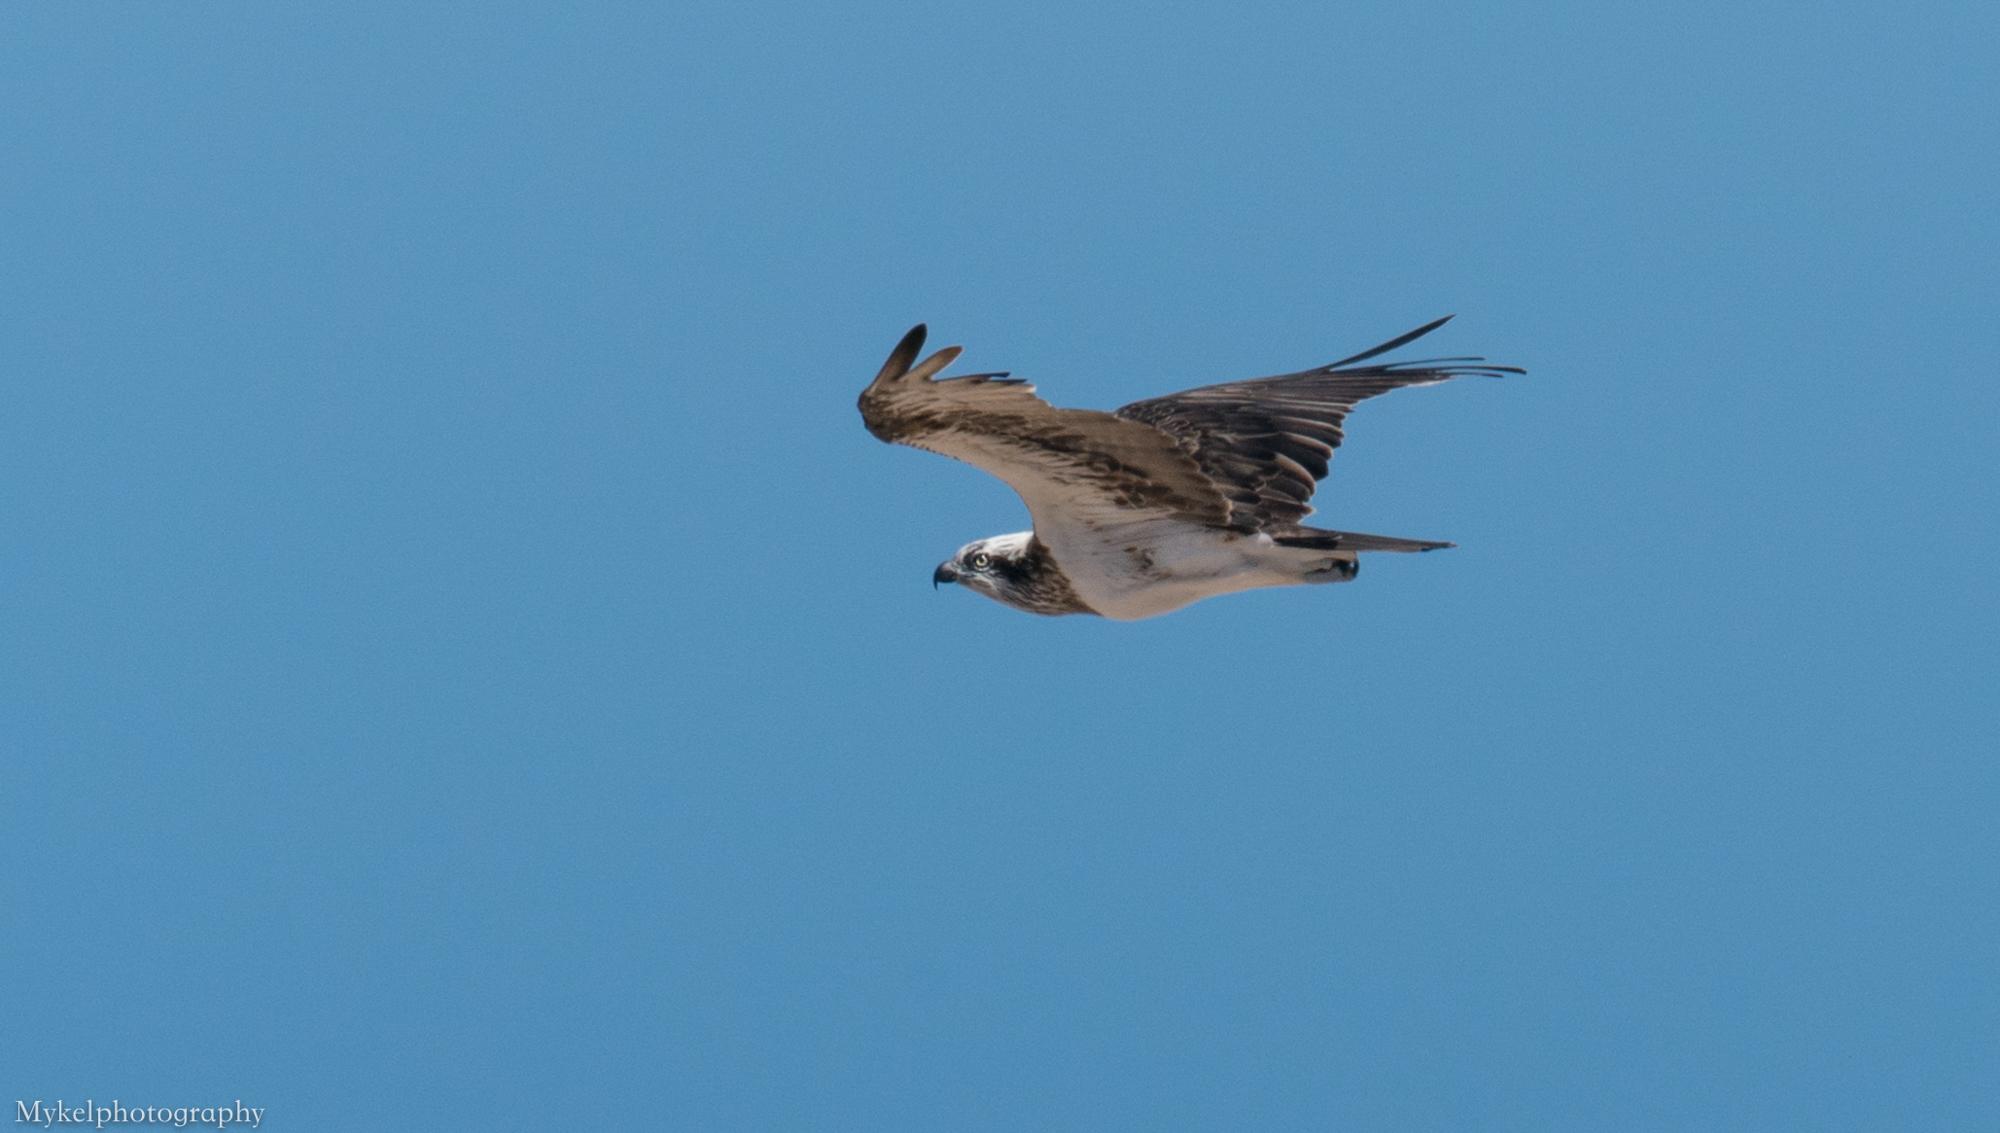 Eastern Osprey, Pandion cristatus Accipitridae